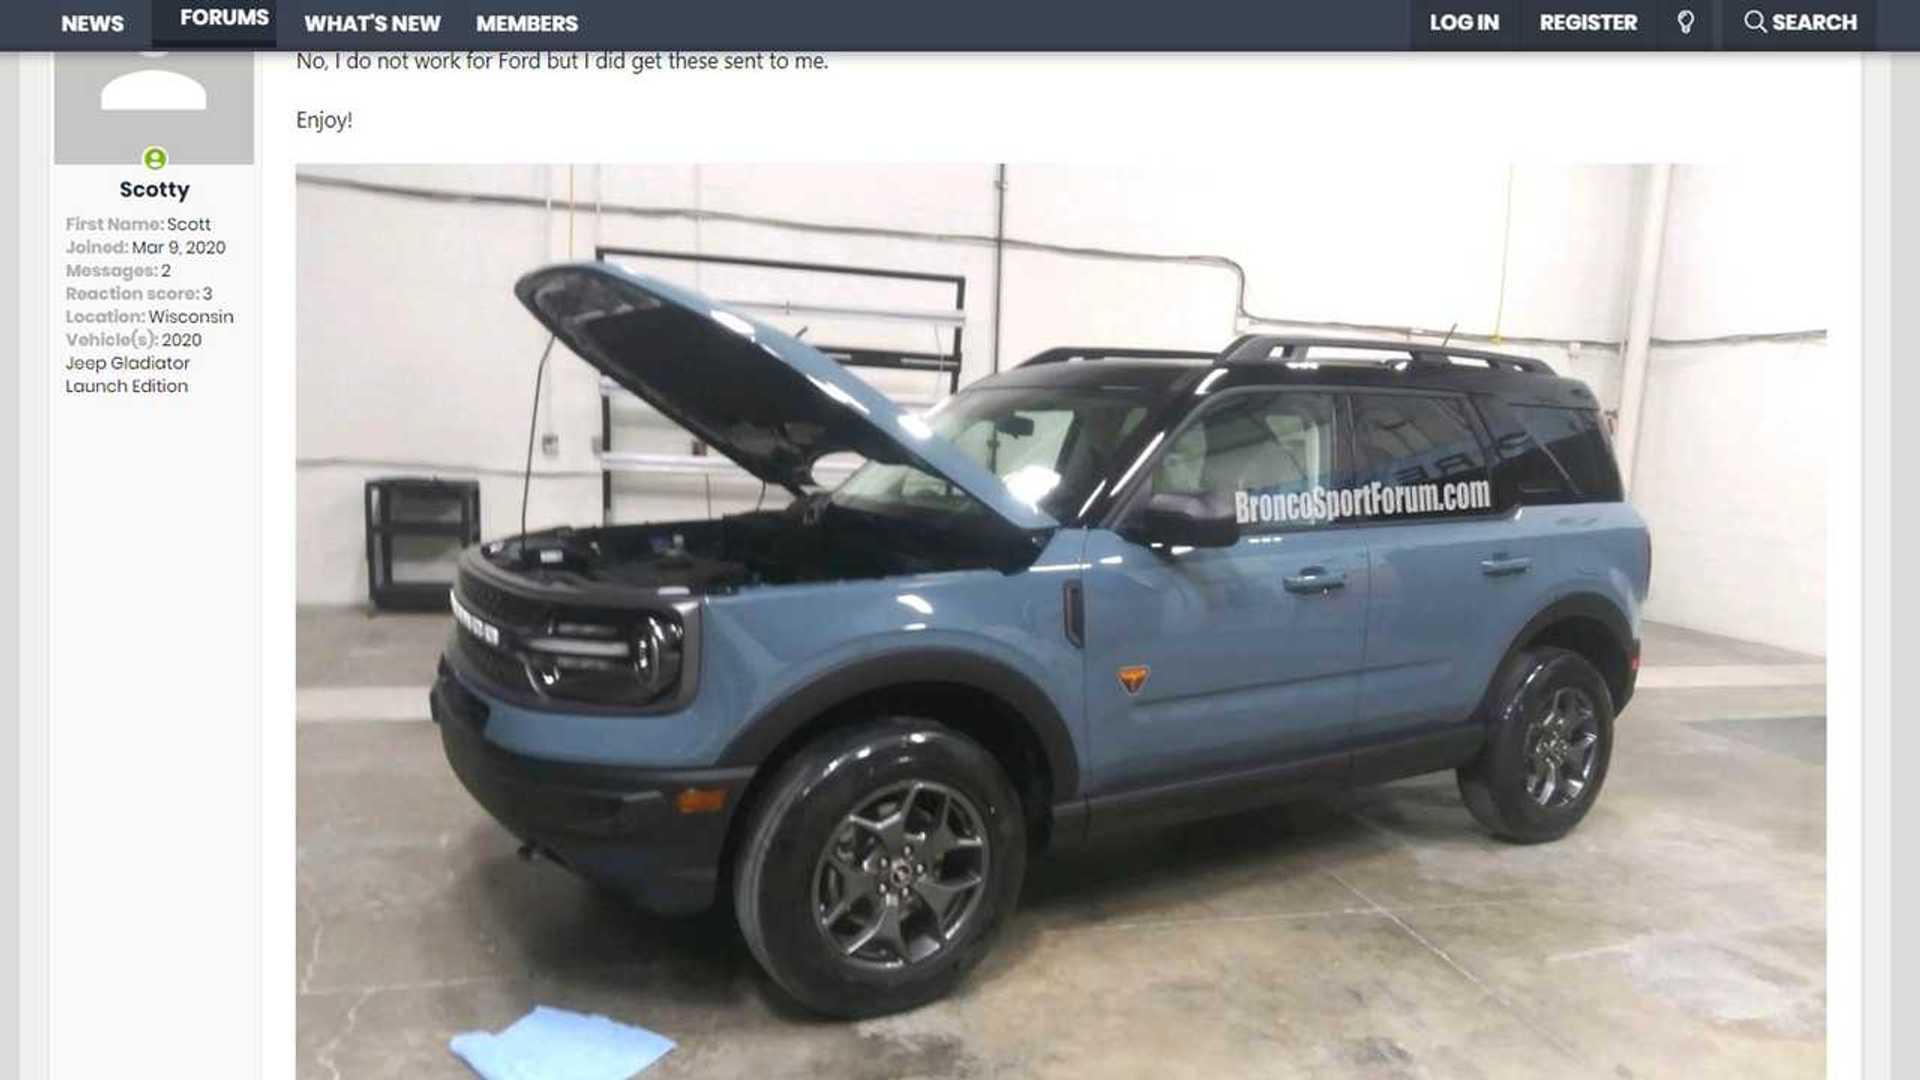 Ford Bronco Sport image screenshot